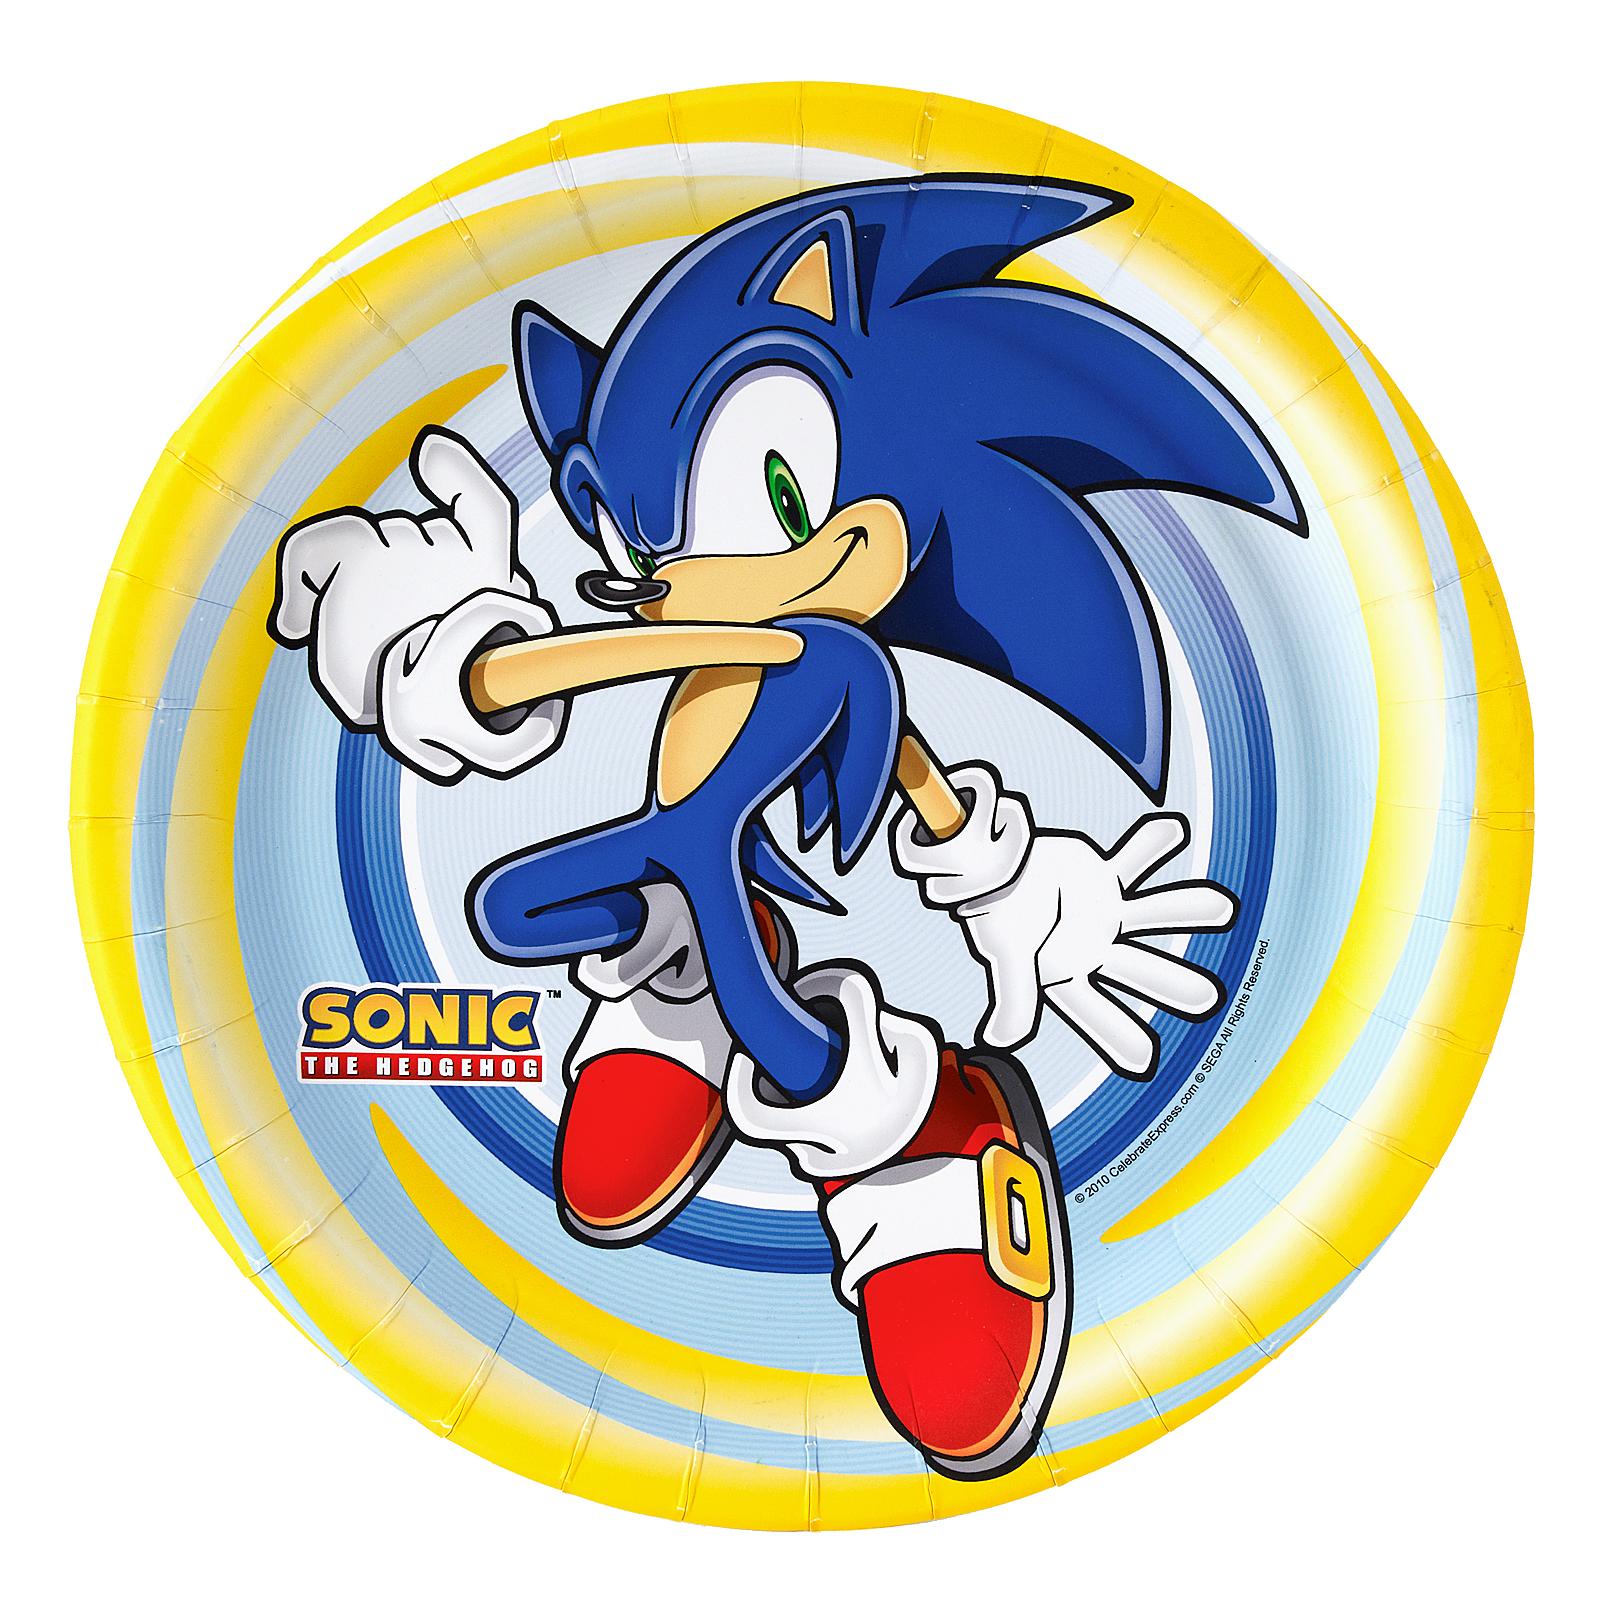 Sonic the Hedgehog Turns 21 - Hey Poor Player Hey Poor Player